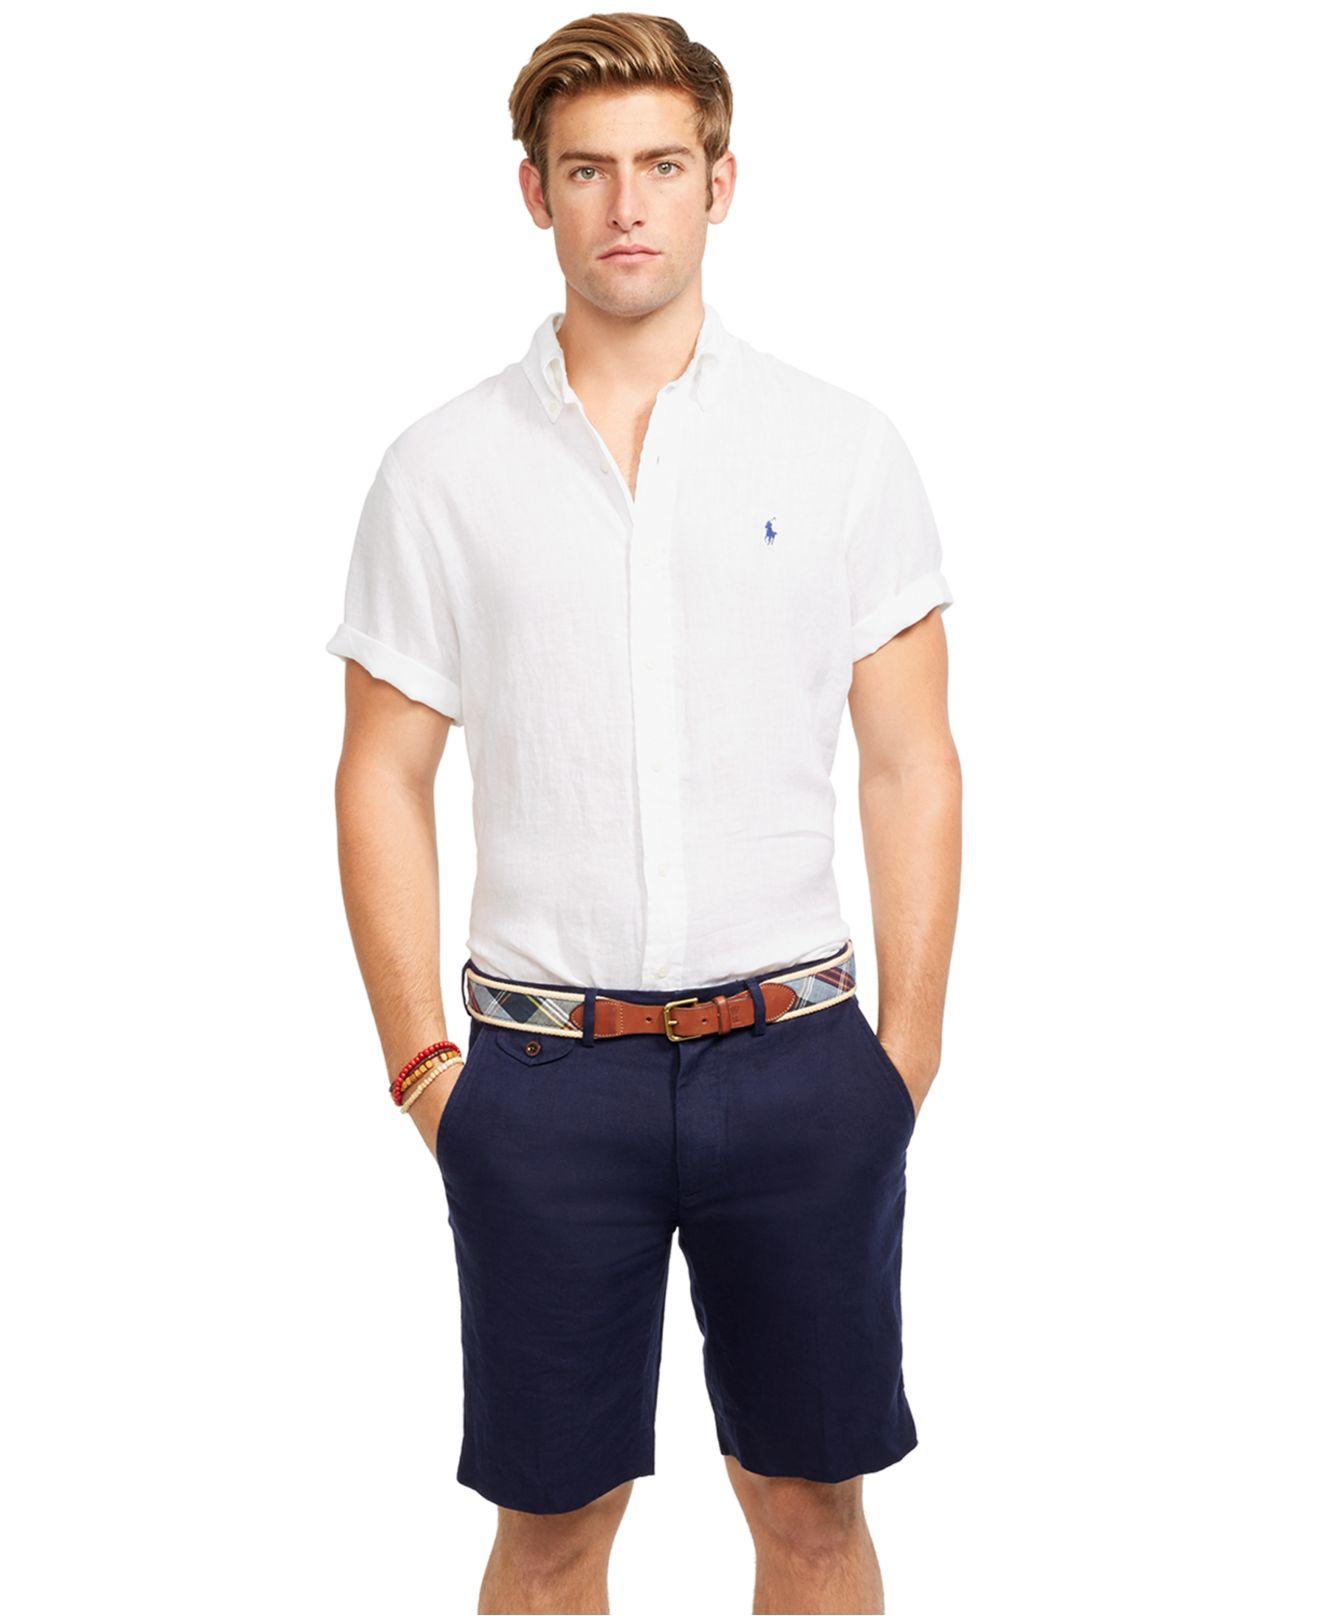 Lyst Polo Ralph Lauren Classic Fit Briton Linen Shorts